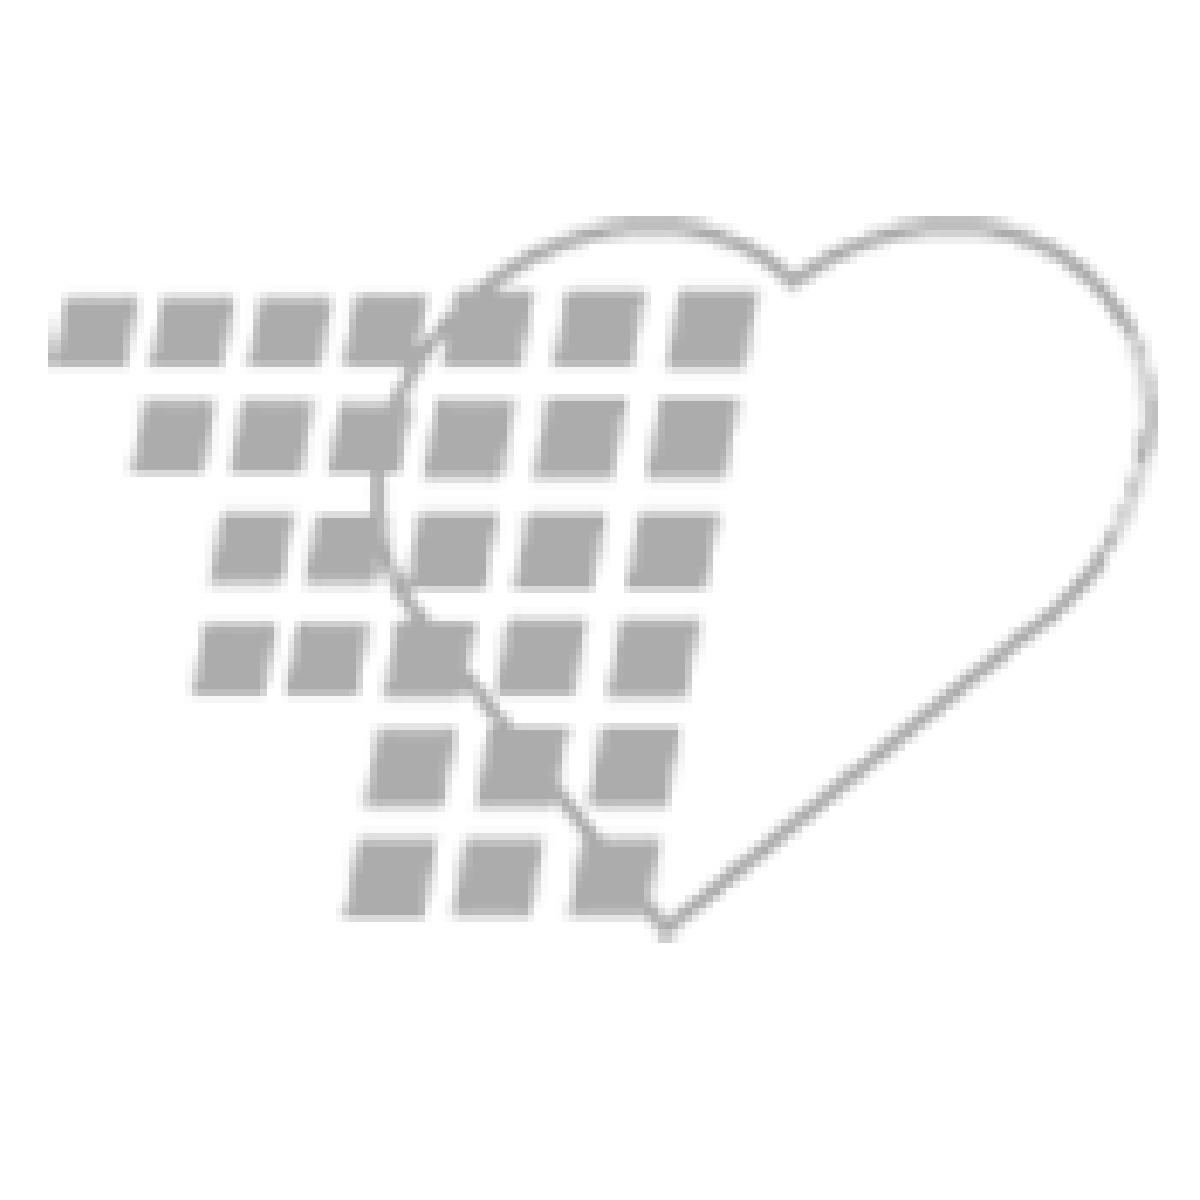 12-81-2124 Simulaids Sani-Baby CPR